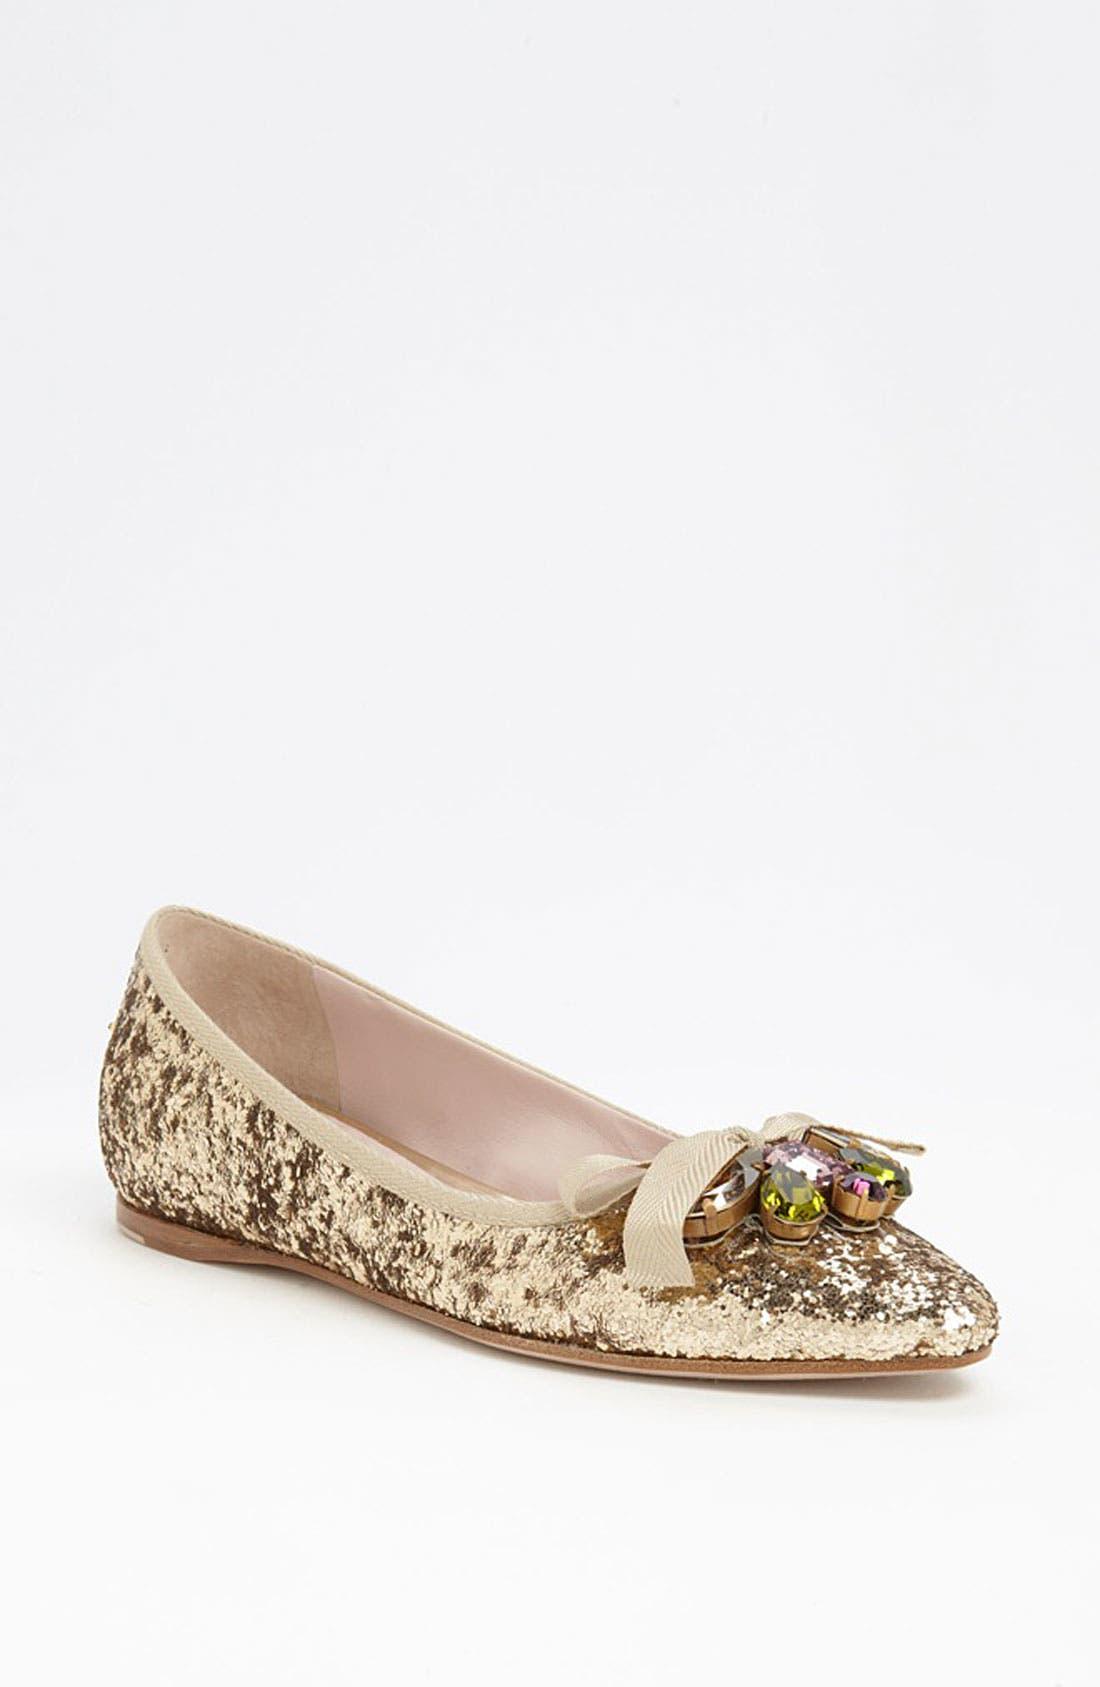 Alternate Image 1 Selected - Miu Miu Jeweled Pointy Toe Flat